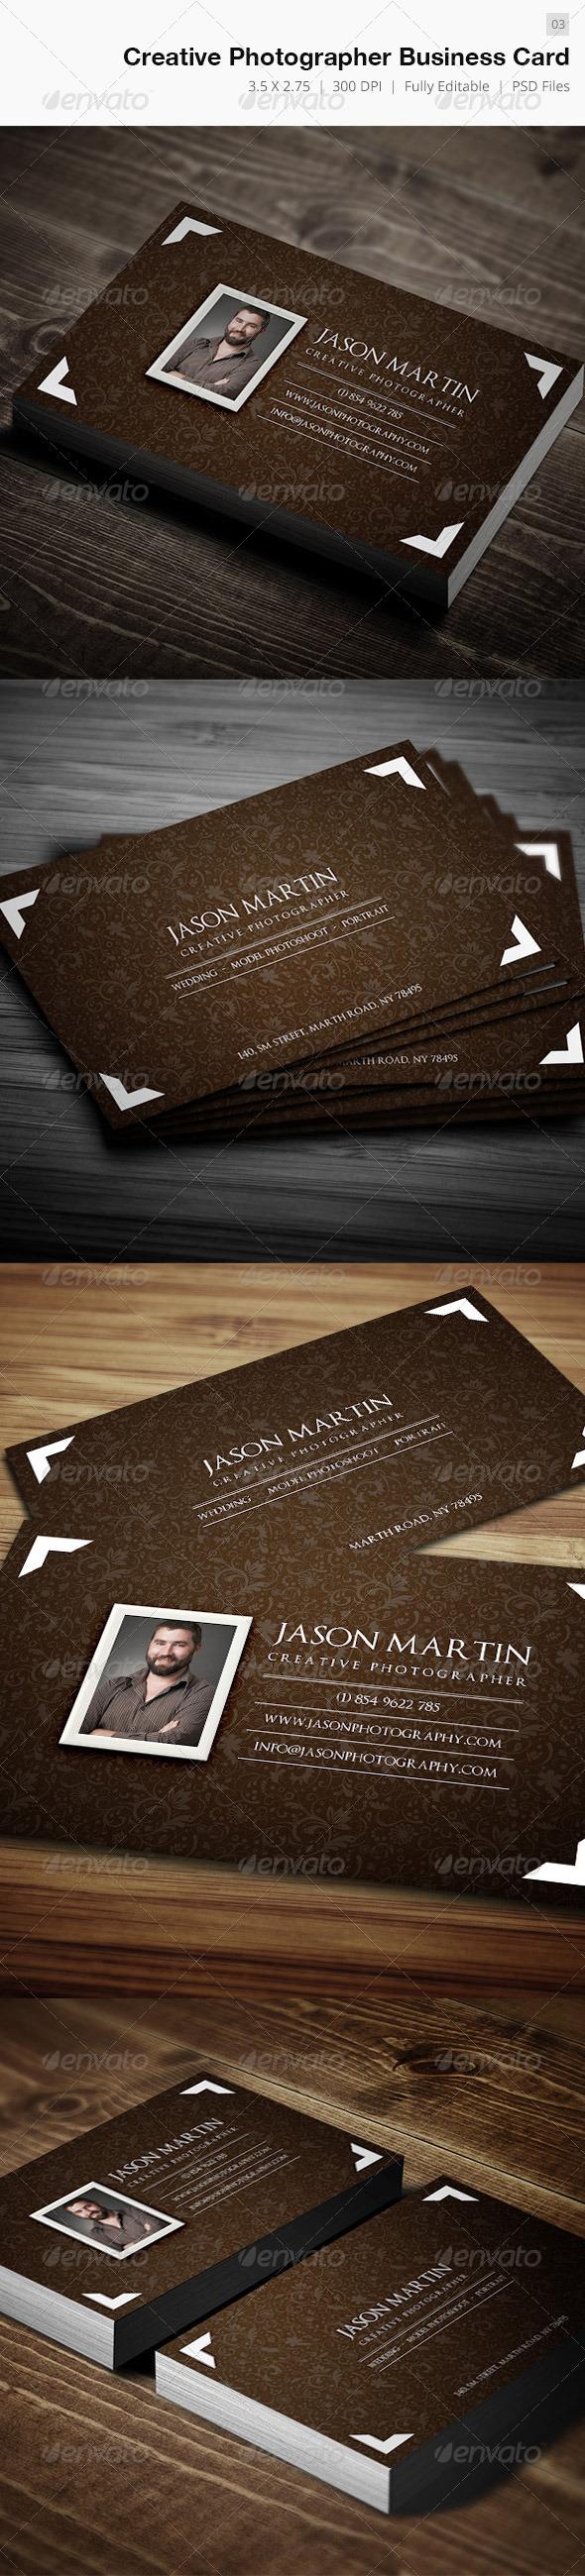 Creative & Royal Photographer Business Card - 03 - Creative Business Cards